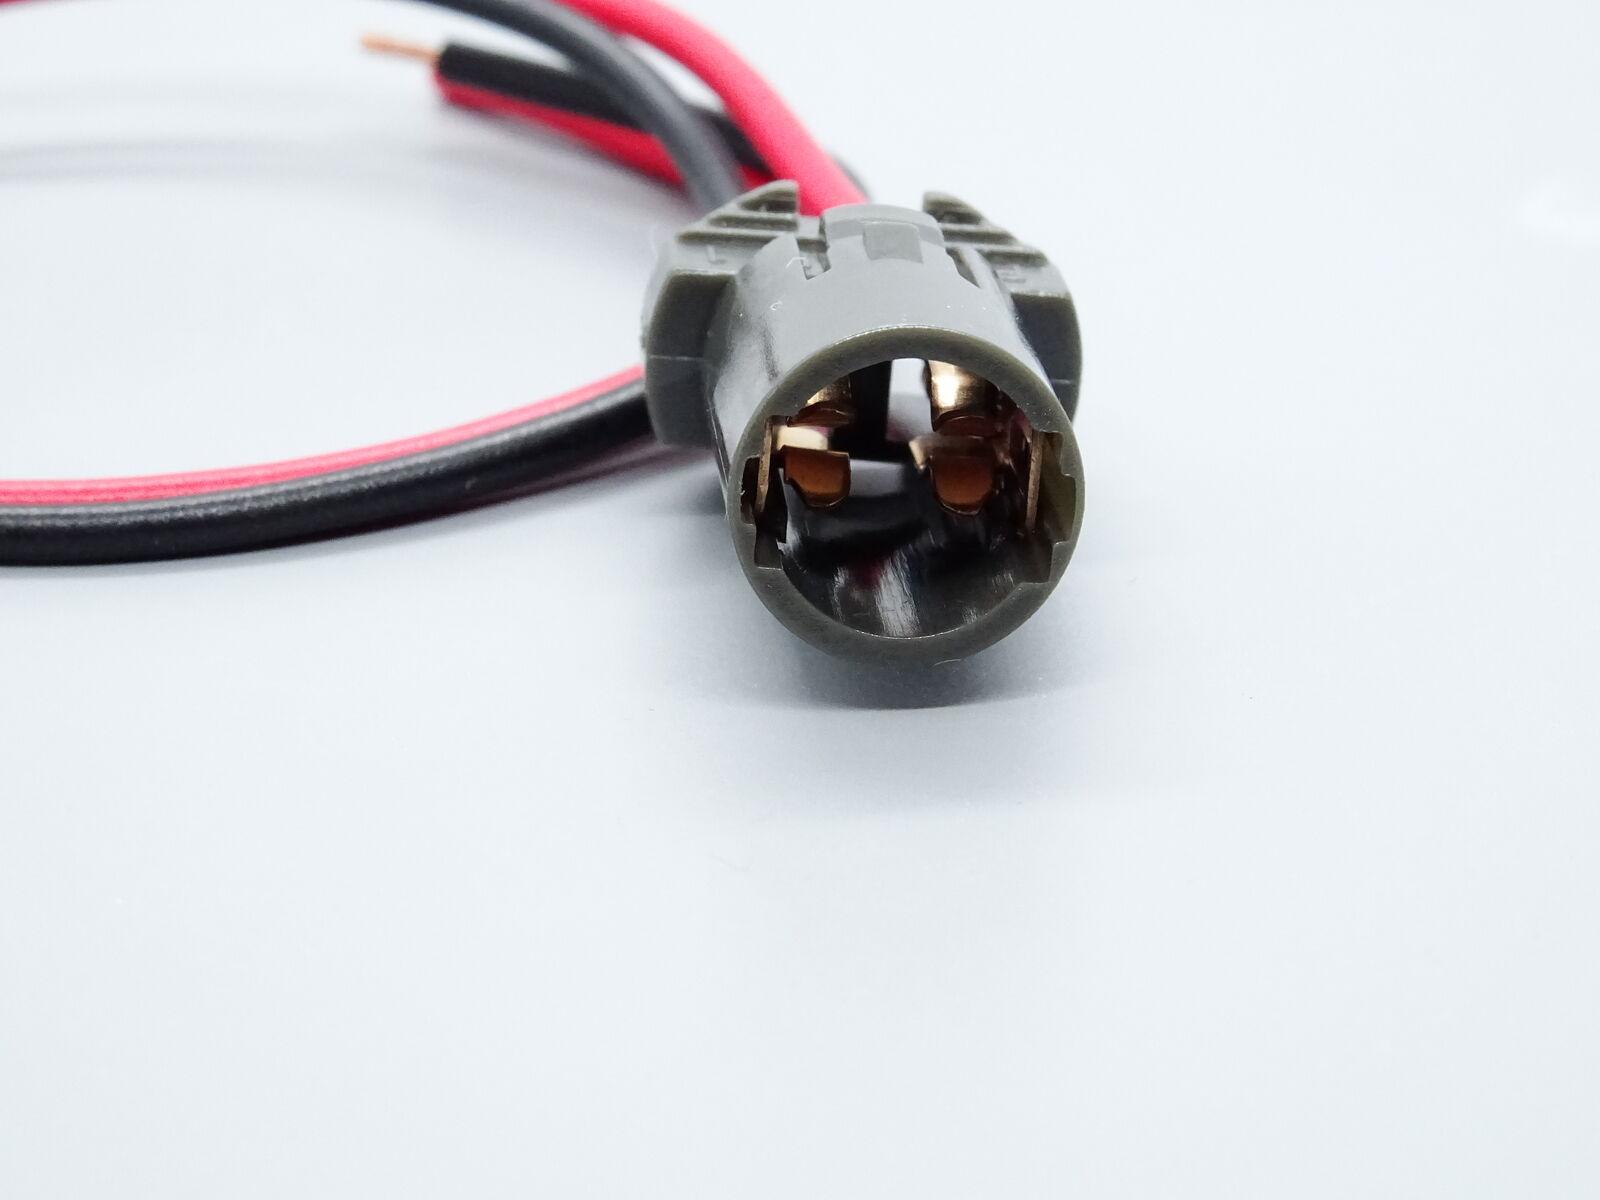 Lampada Versione Spina Riparazione per attacco t5 t5 w2x4,6d Lampade Versione